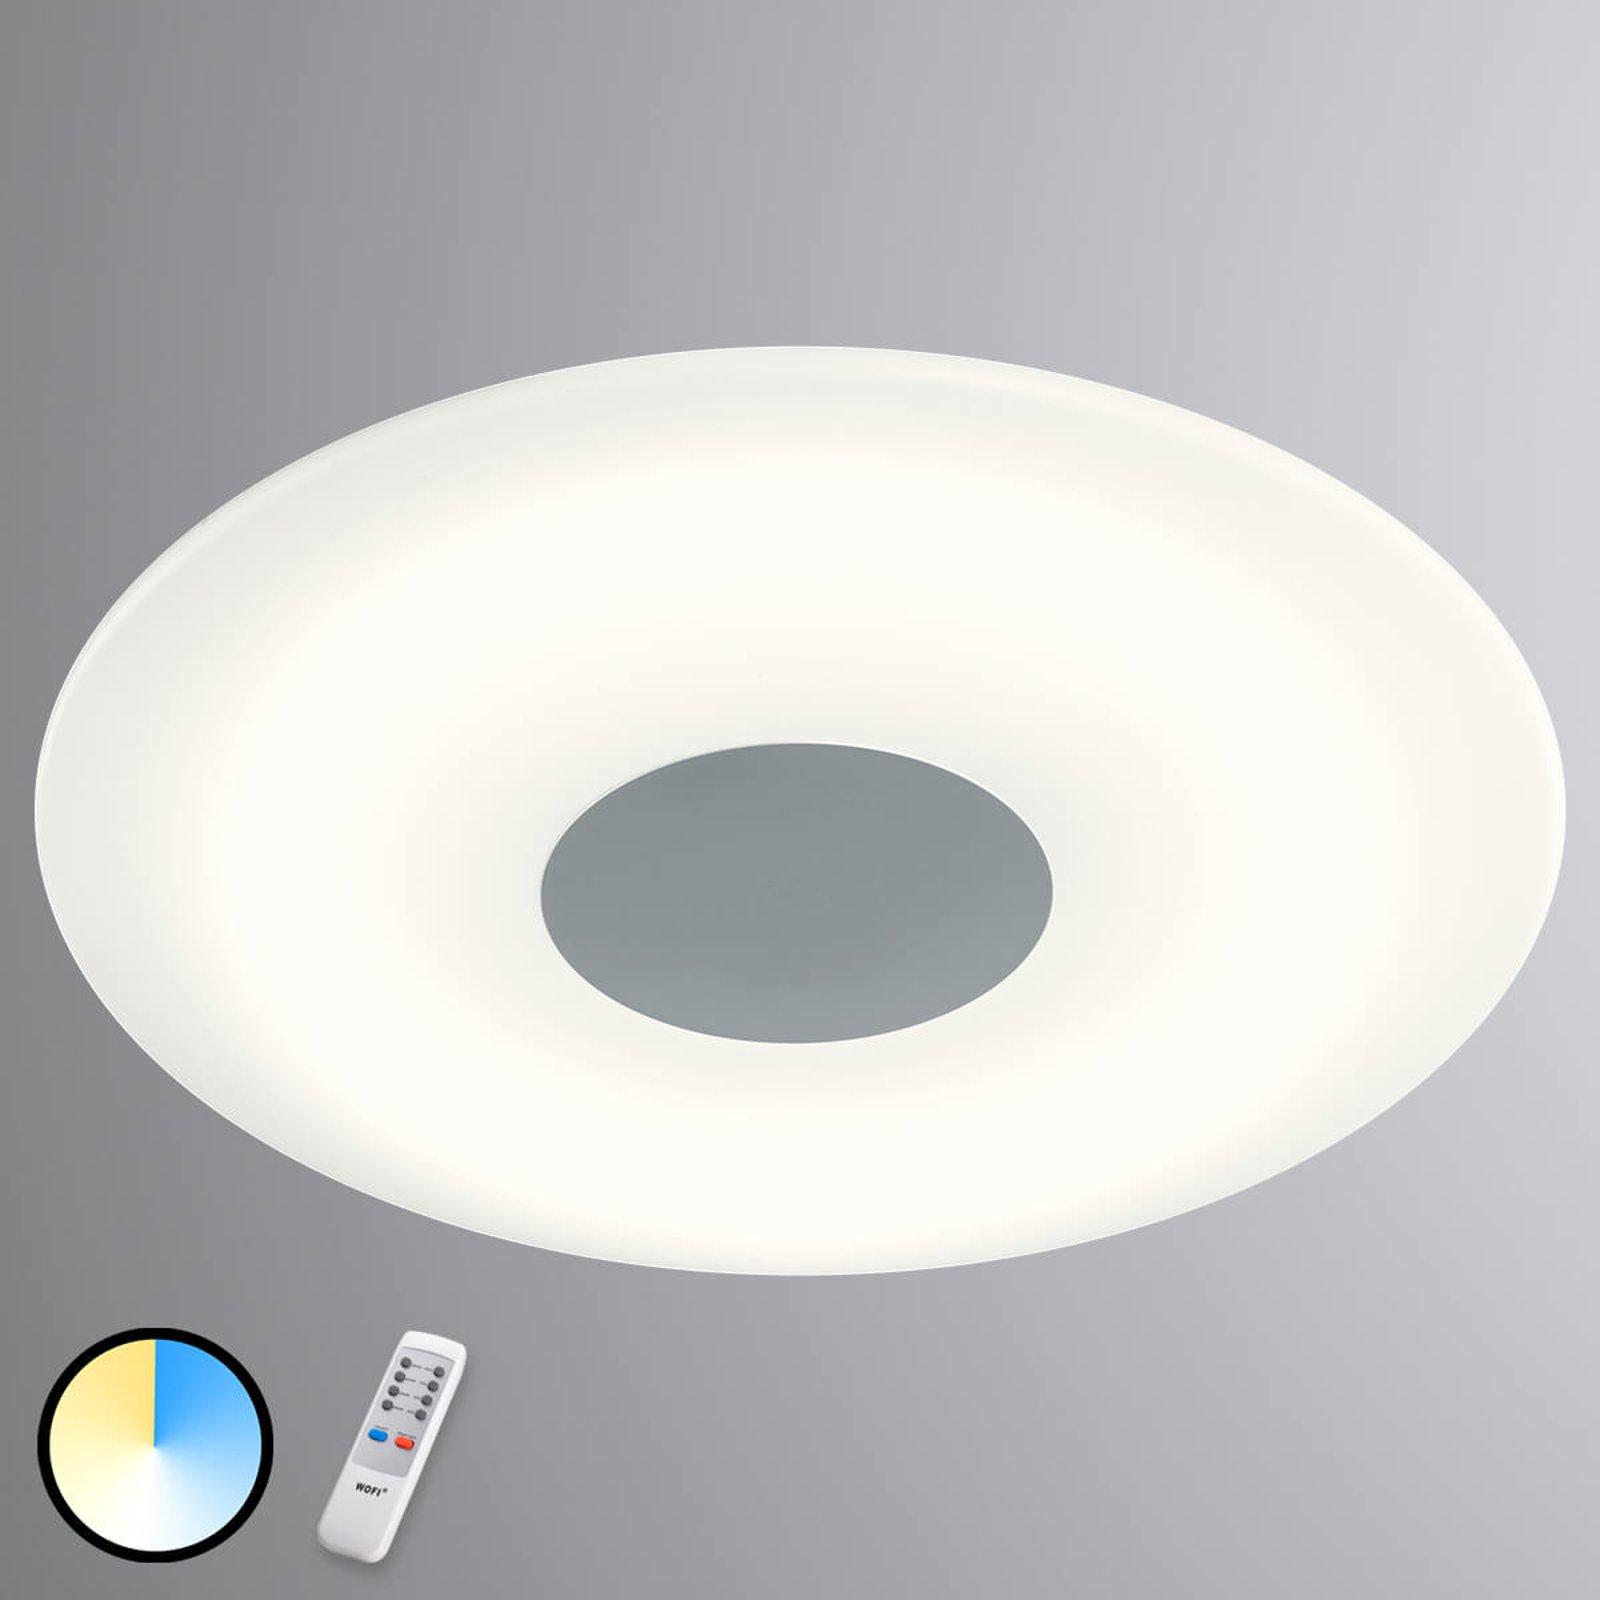 Variabel lysfarge med taklampen Kara med LED-lys